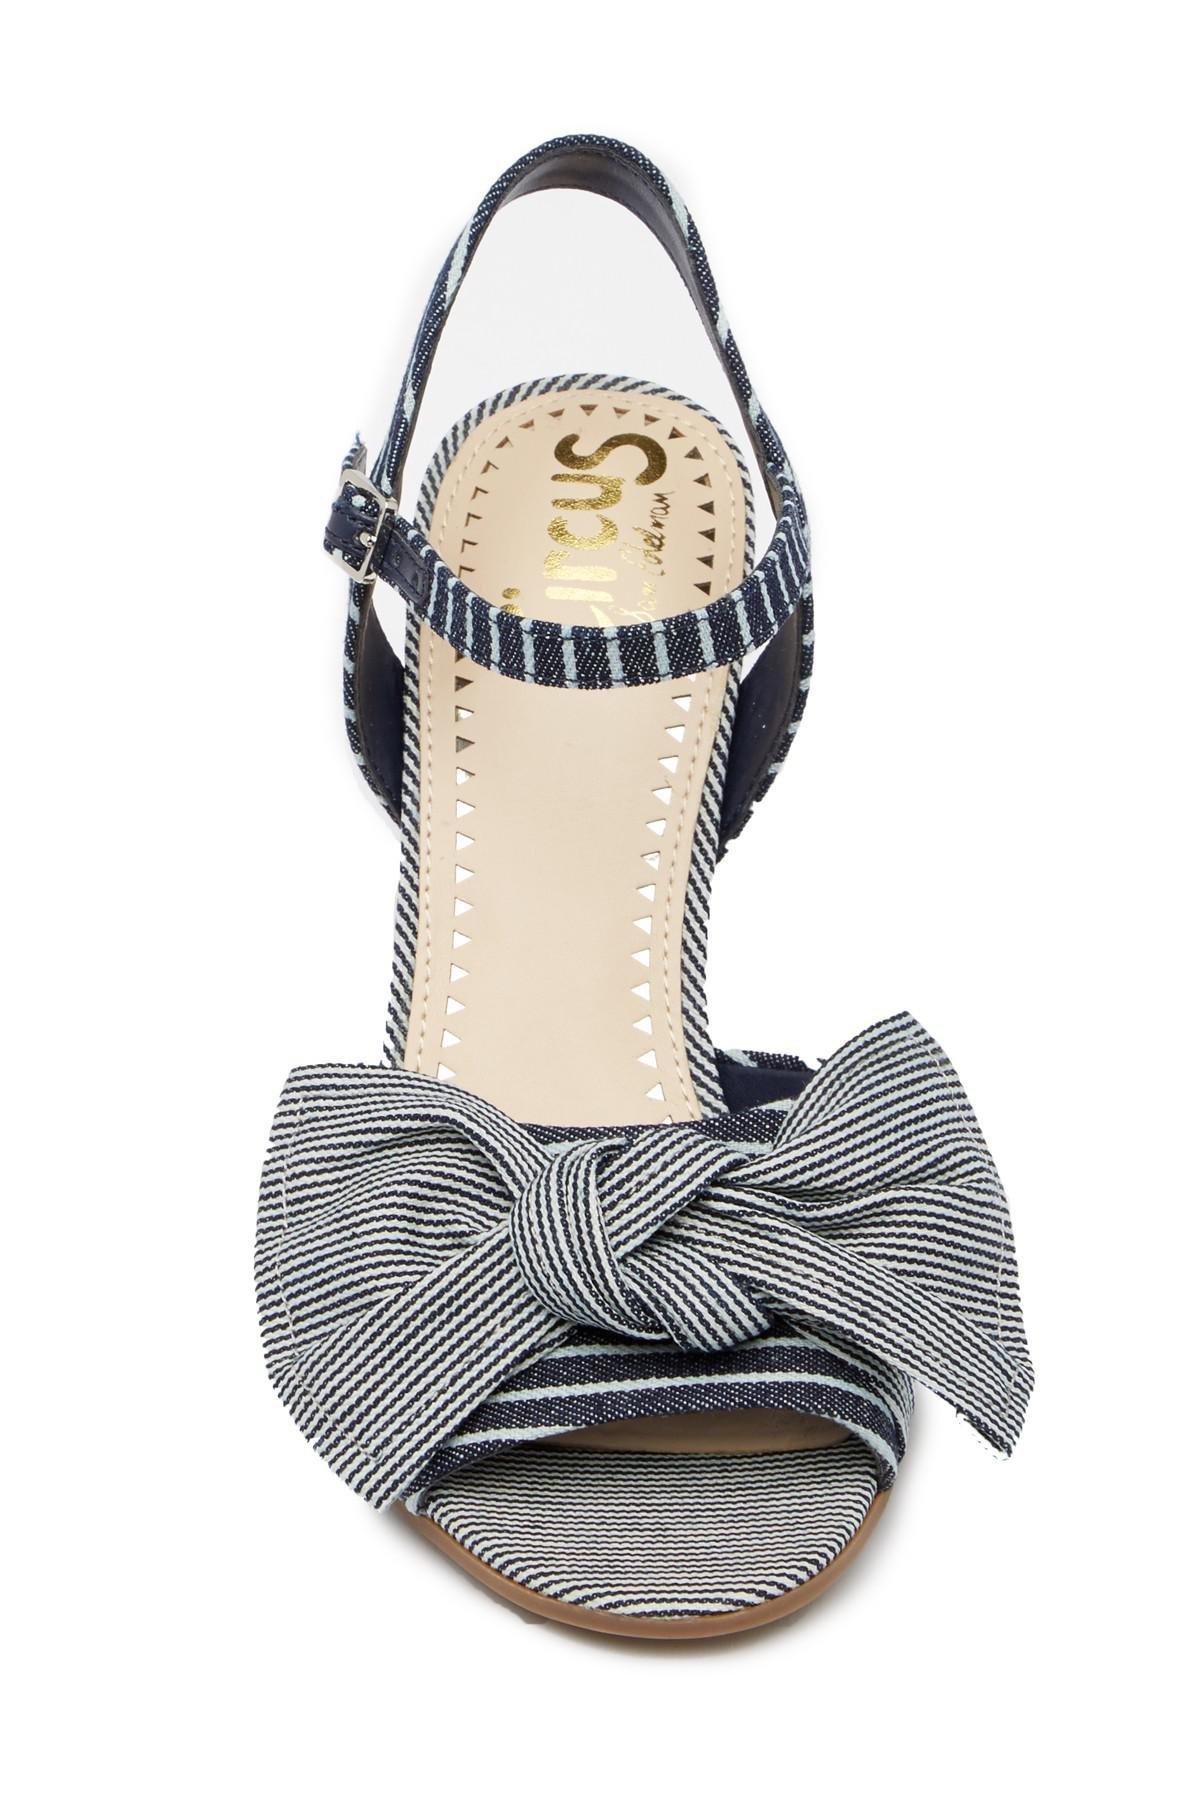 791fefd62 Lyst - Circus by Sam Edelman Eva Block Heel Sandal in Blue